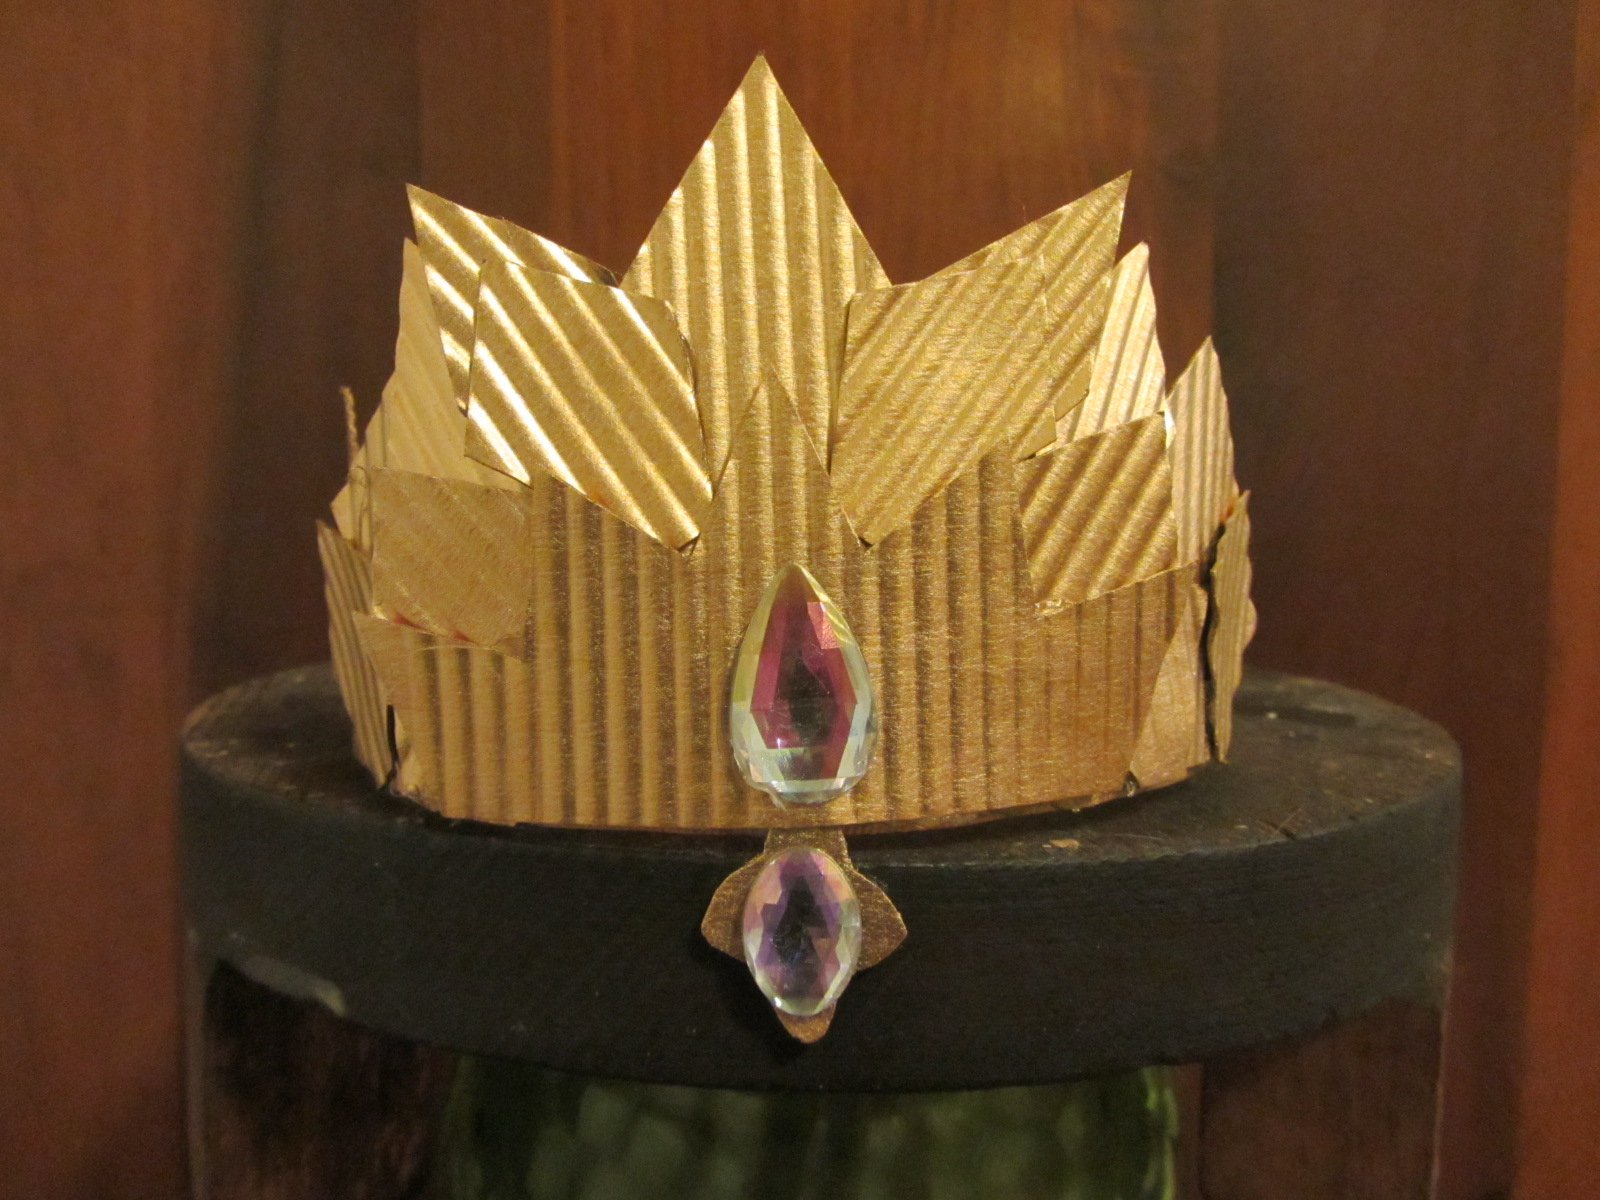 DIY Glinda the Good Tiara (Oz the Great and Powerful)